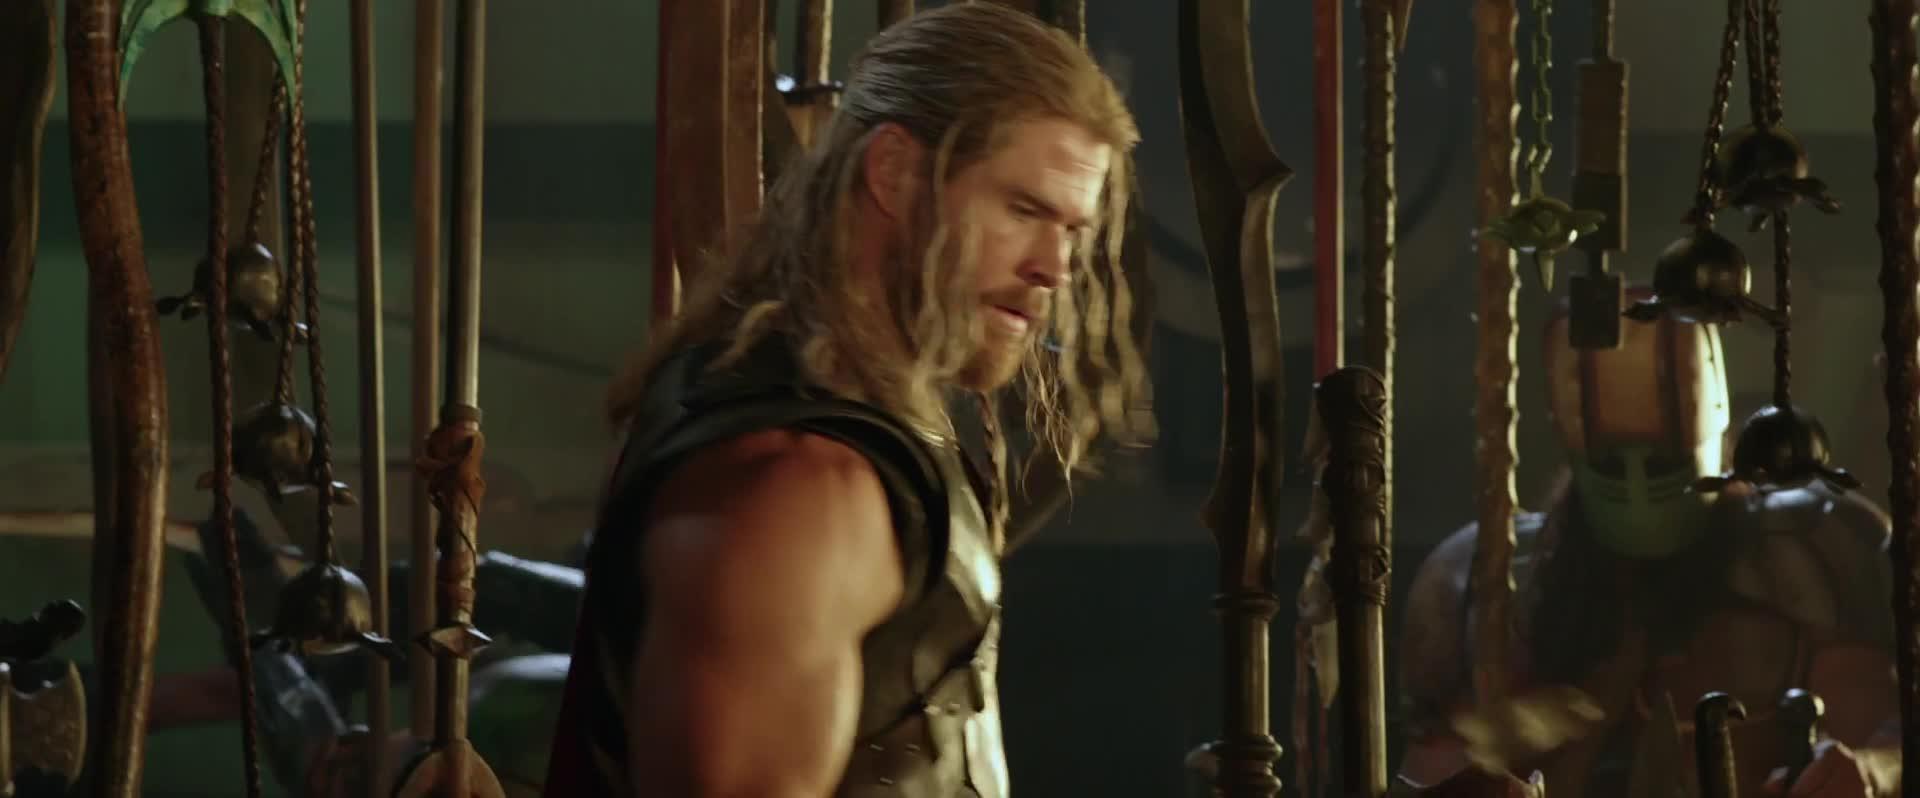 chris hemsworth, comic books, comics, geeky, marvel, mjolnir, movies, nerdy, super hero, superhero, thor ragnarok, thor: ragnarok, Thor: Ragnarok - R.I.P. Mjolnir (Hammer) GIFs